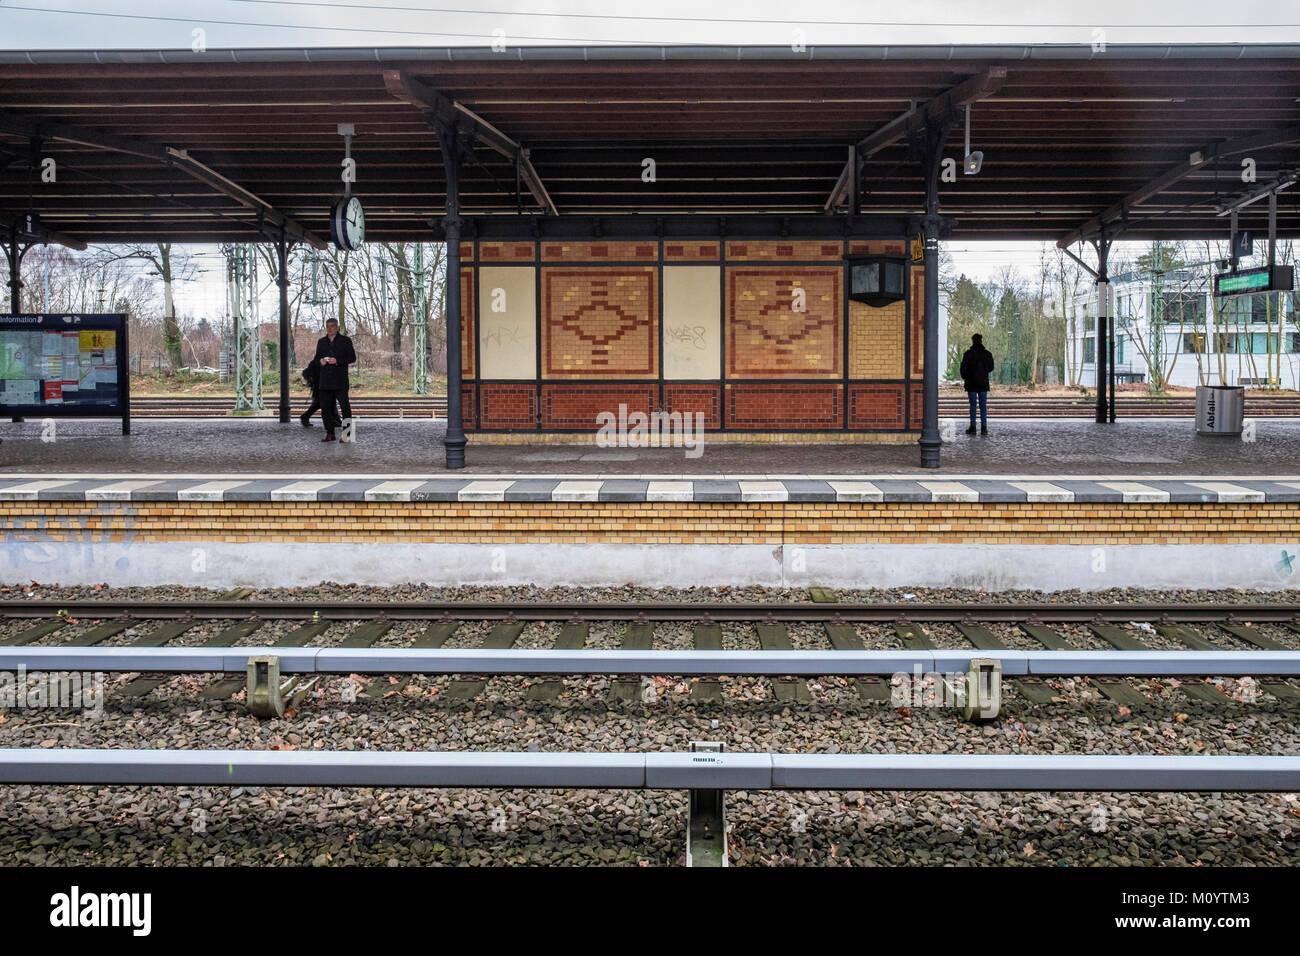 Berlin-Grunewald S-Bahn railway station serves the S7 line of the commuter rail network, Platform & rail tracks - Stock Image